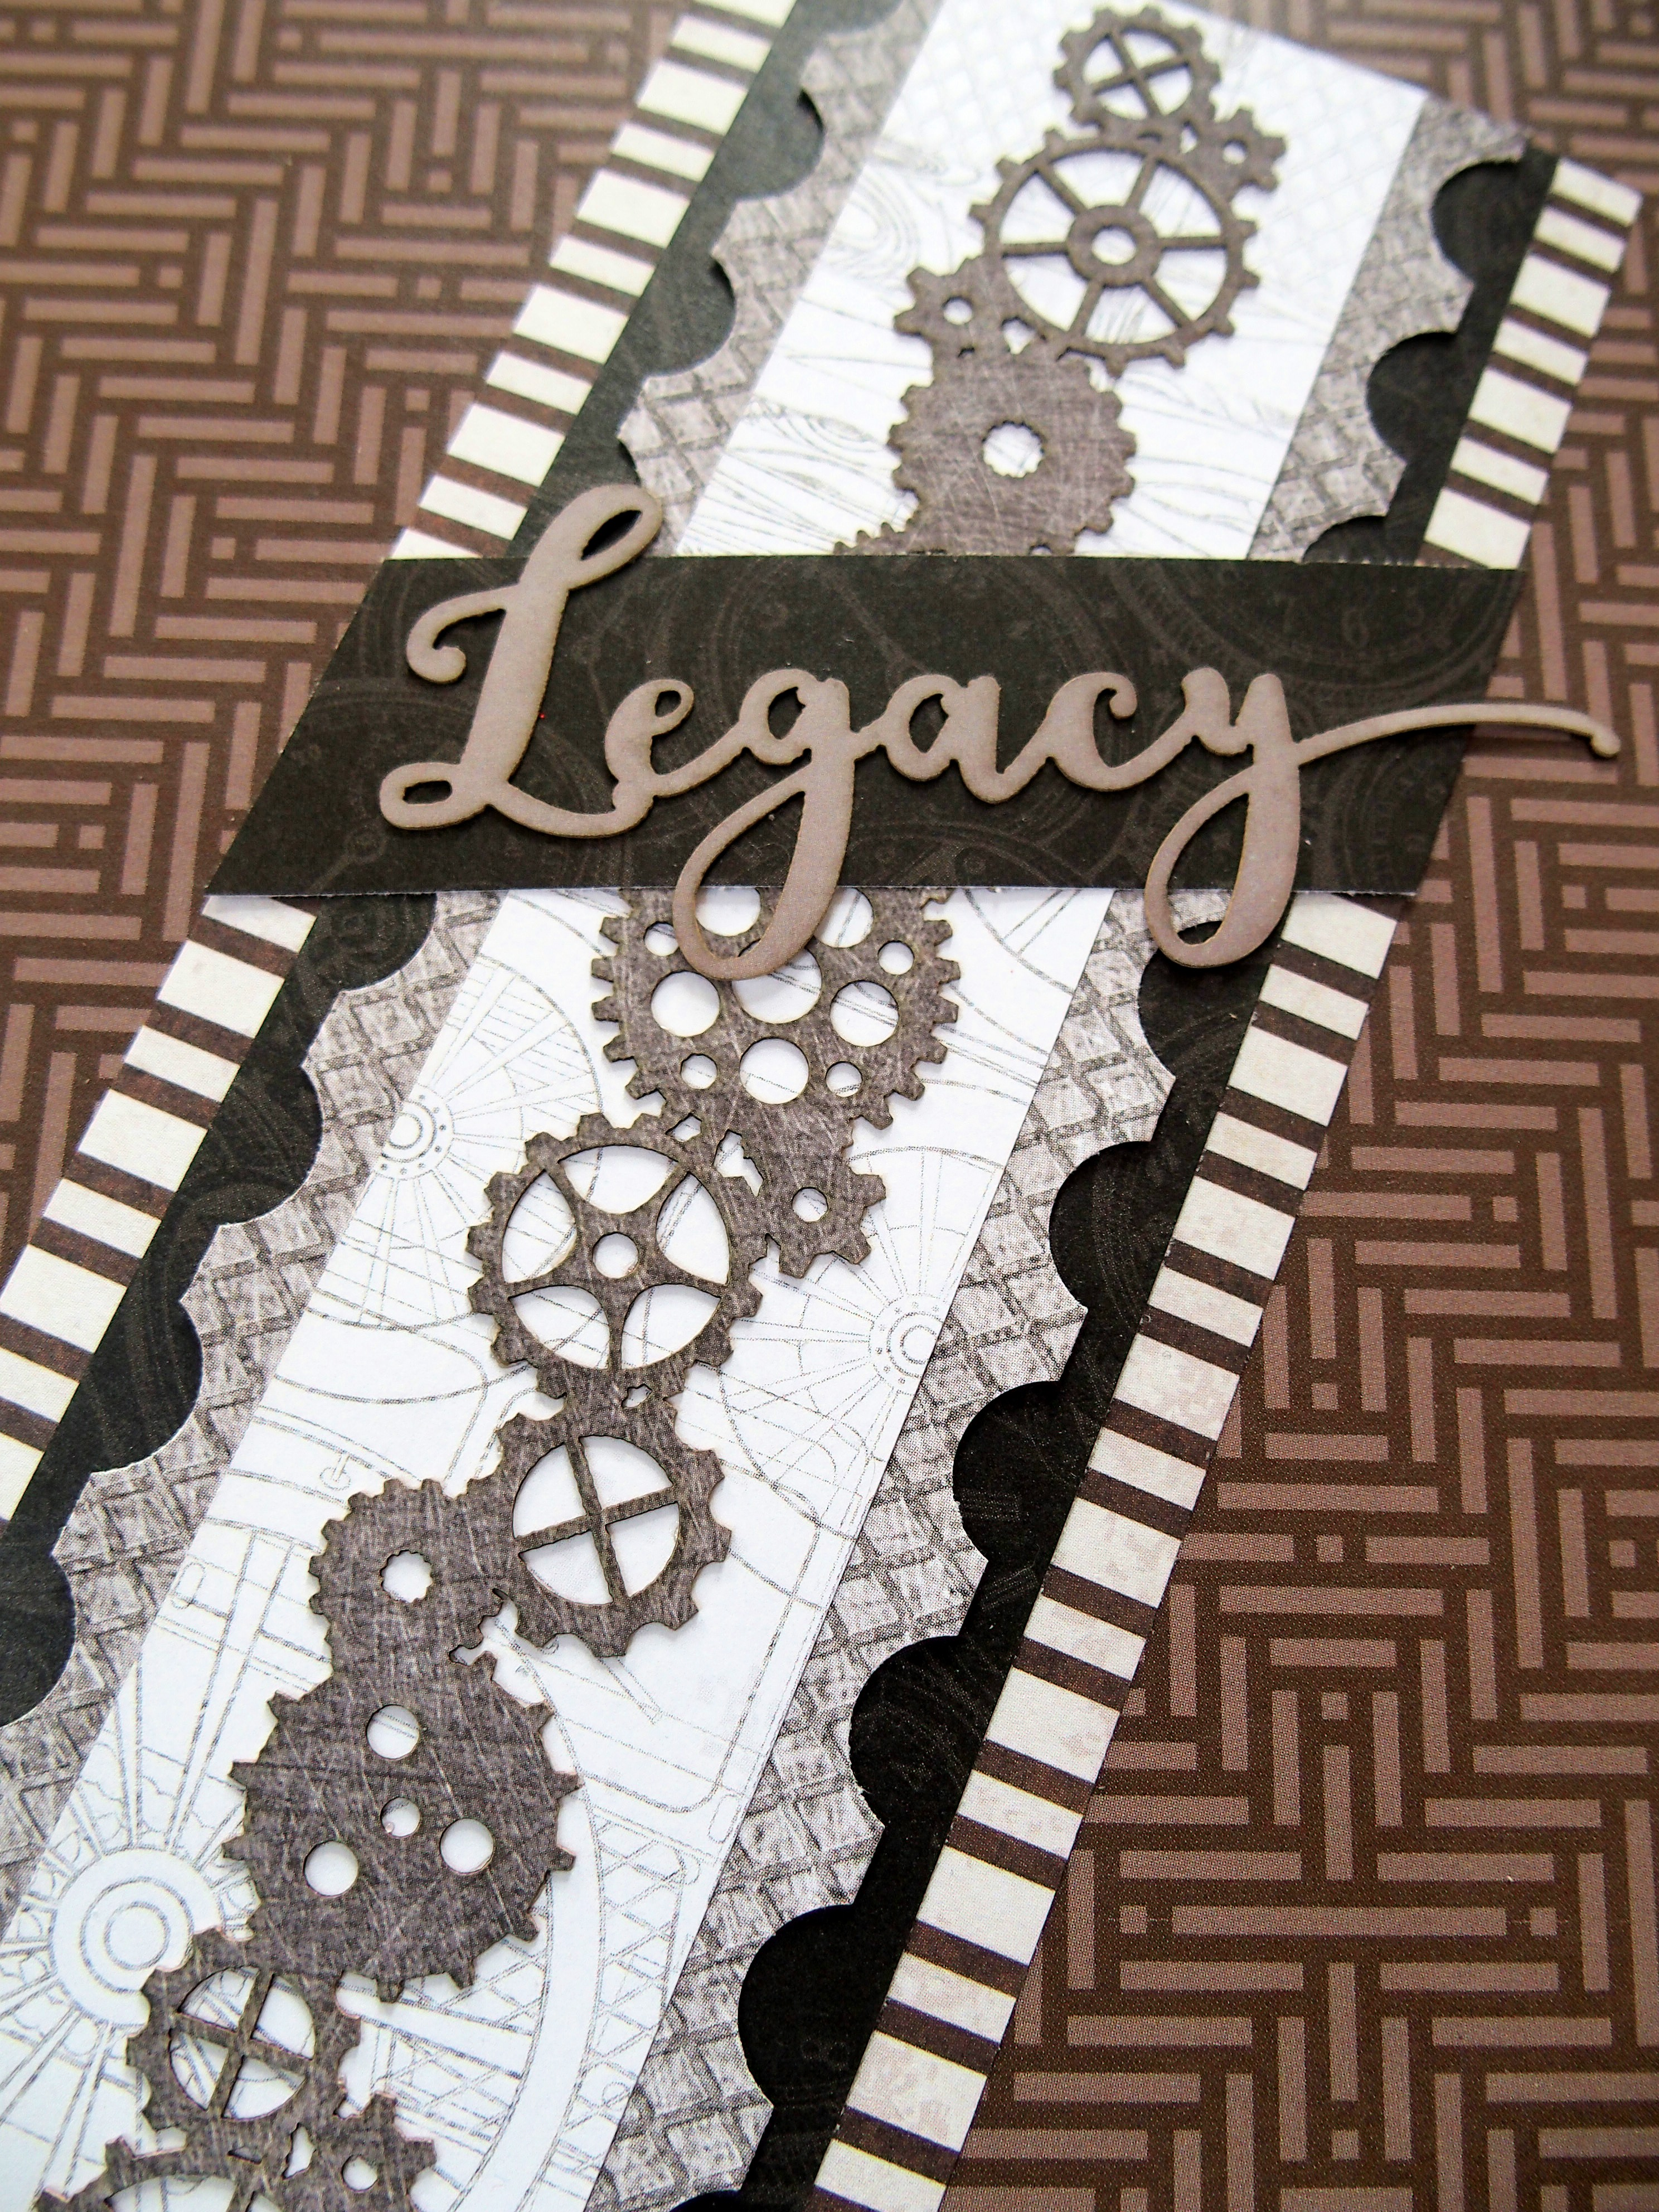 Archiver's-Heritage-Borders-Creative-Memories